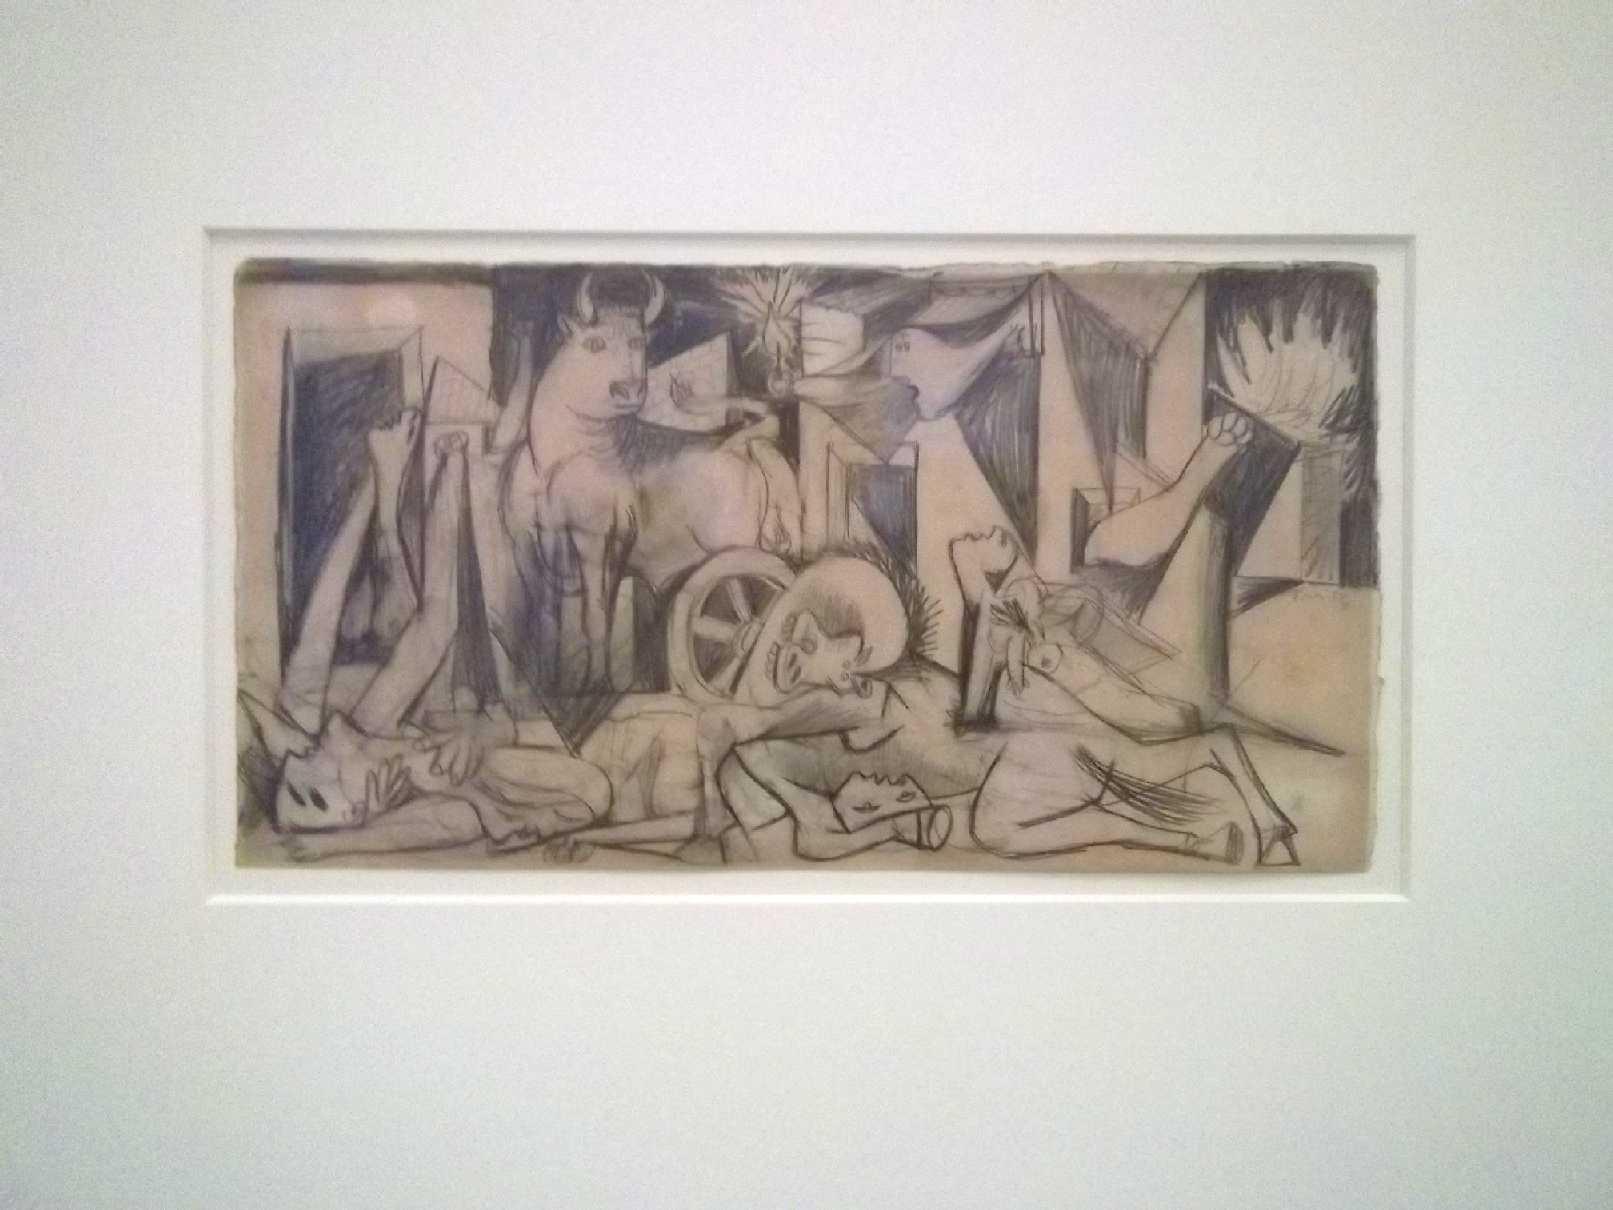 Picasso Guernica Sketches Estudio para Guernica 2  c